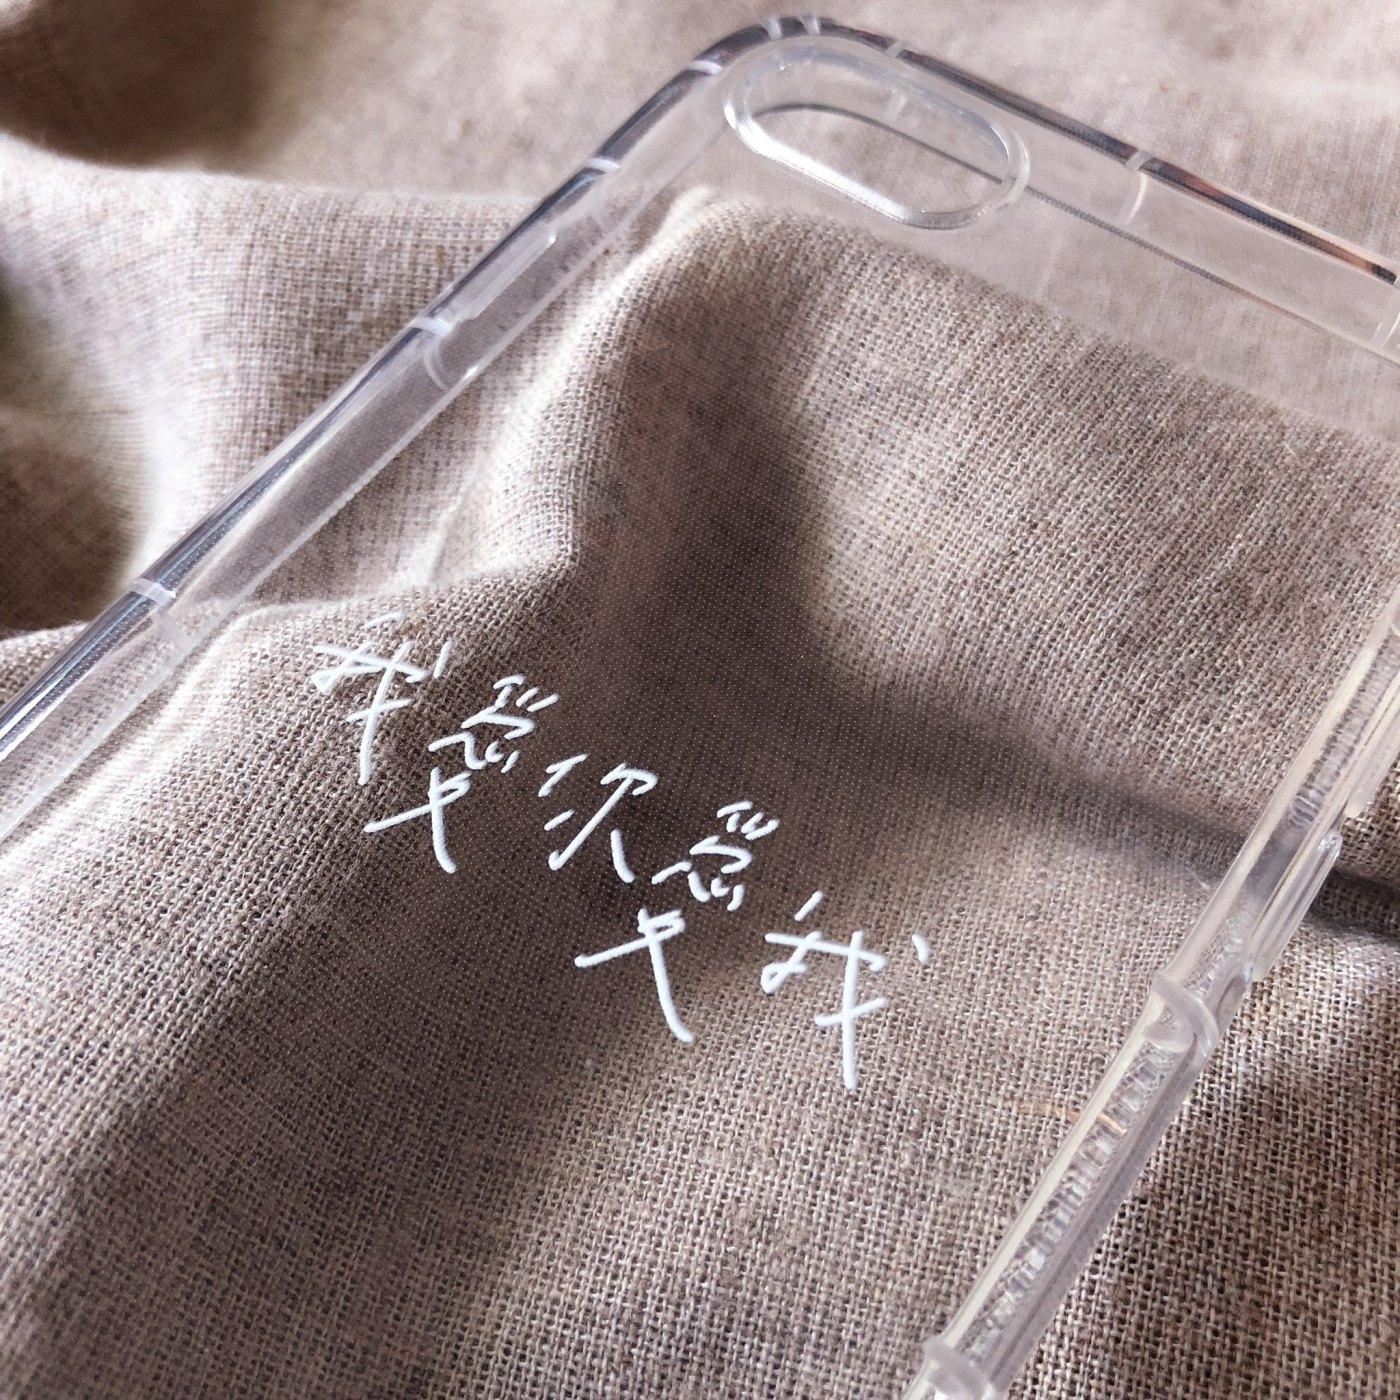 42615484334 277cebdfcb k 簡約的透明空壓殼,單純欣賞手寫帶來的溫度美感!